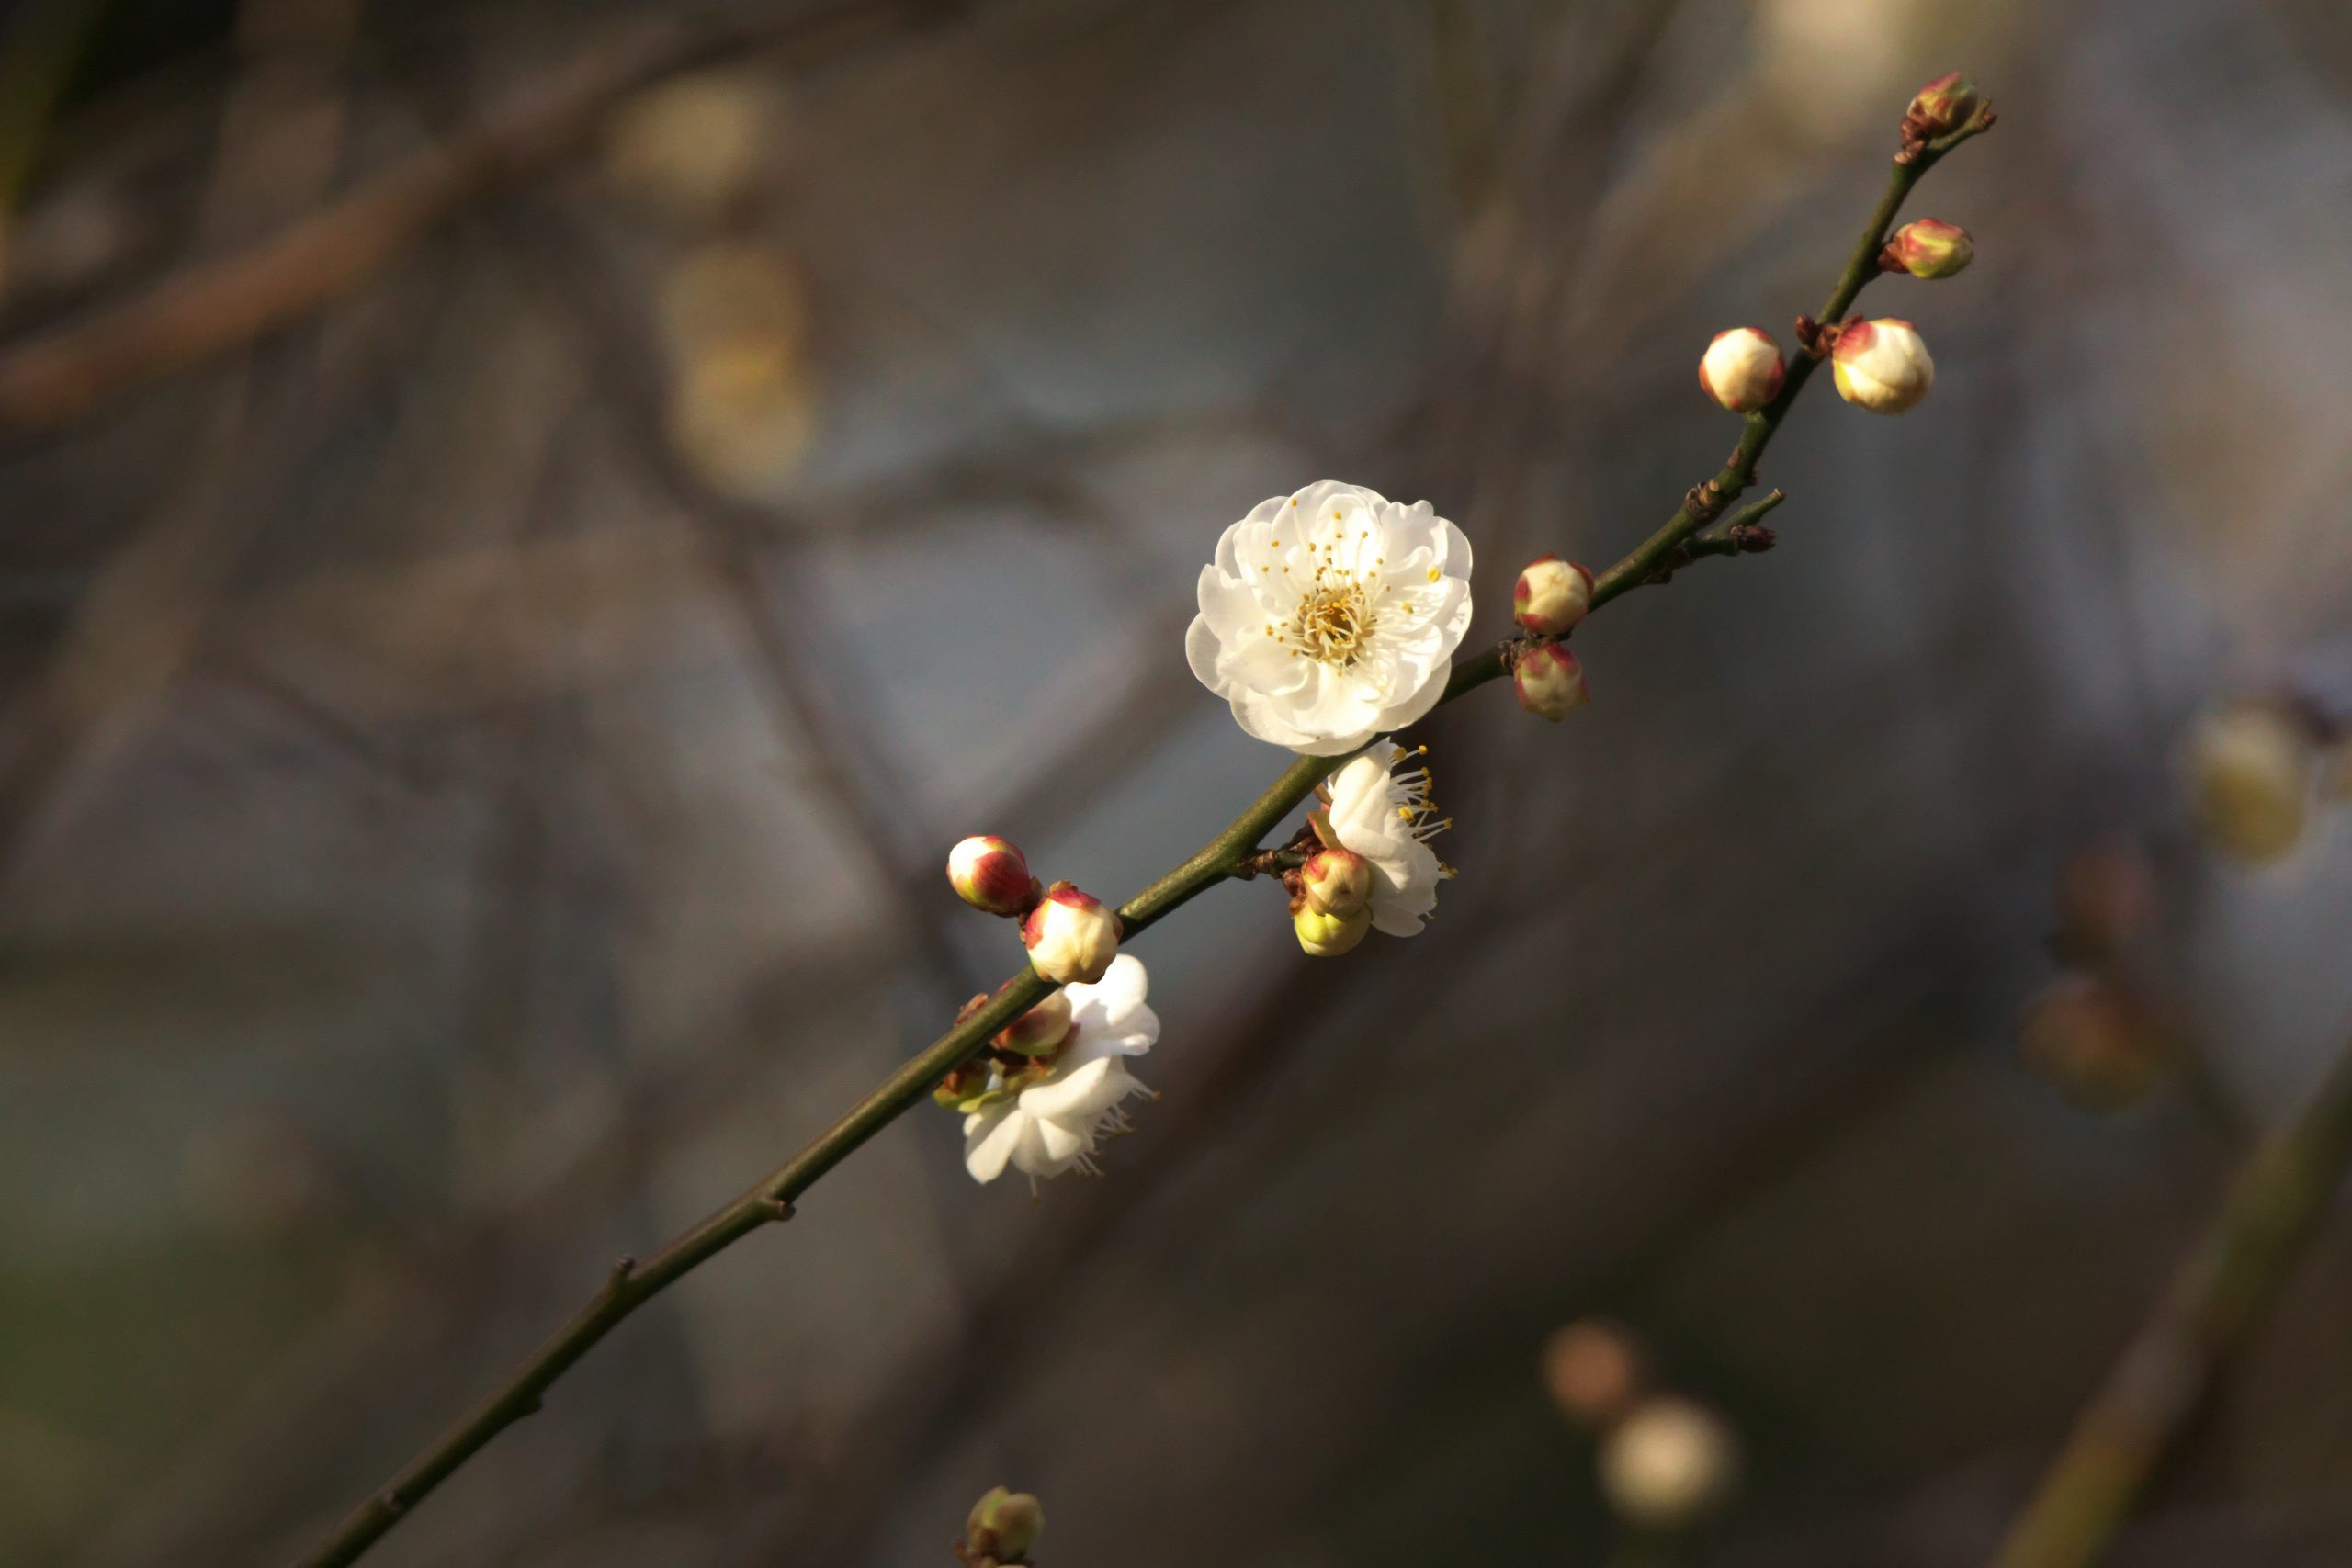 【SONY】この季節に咲く花(16)